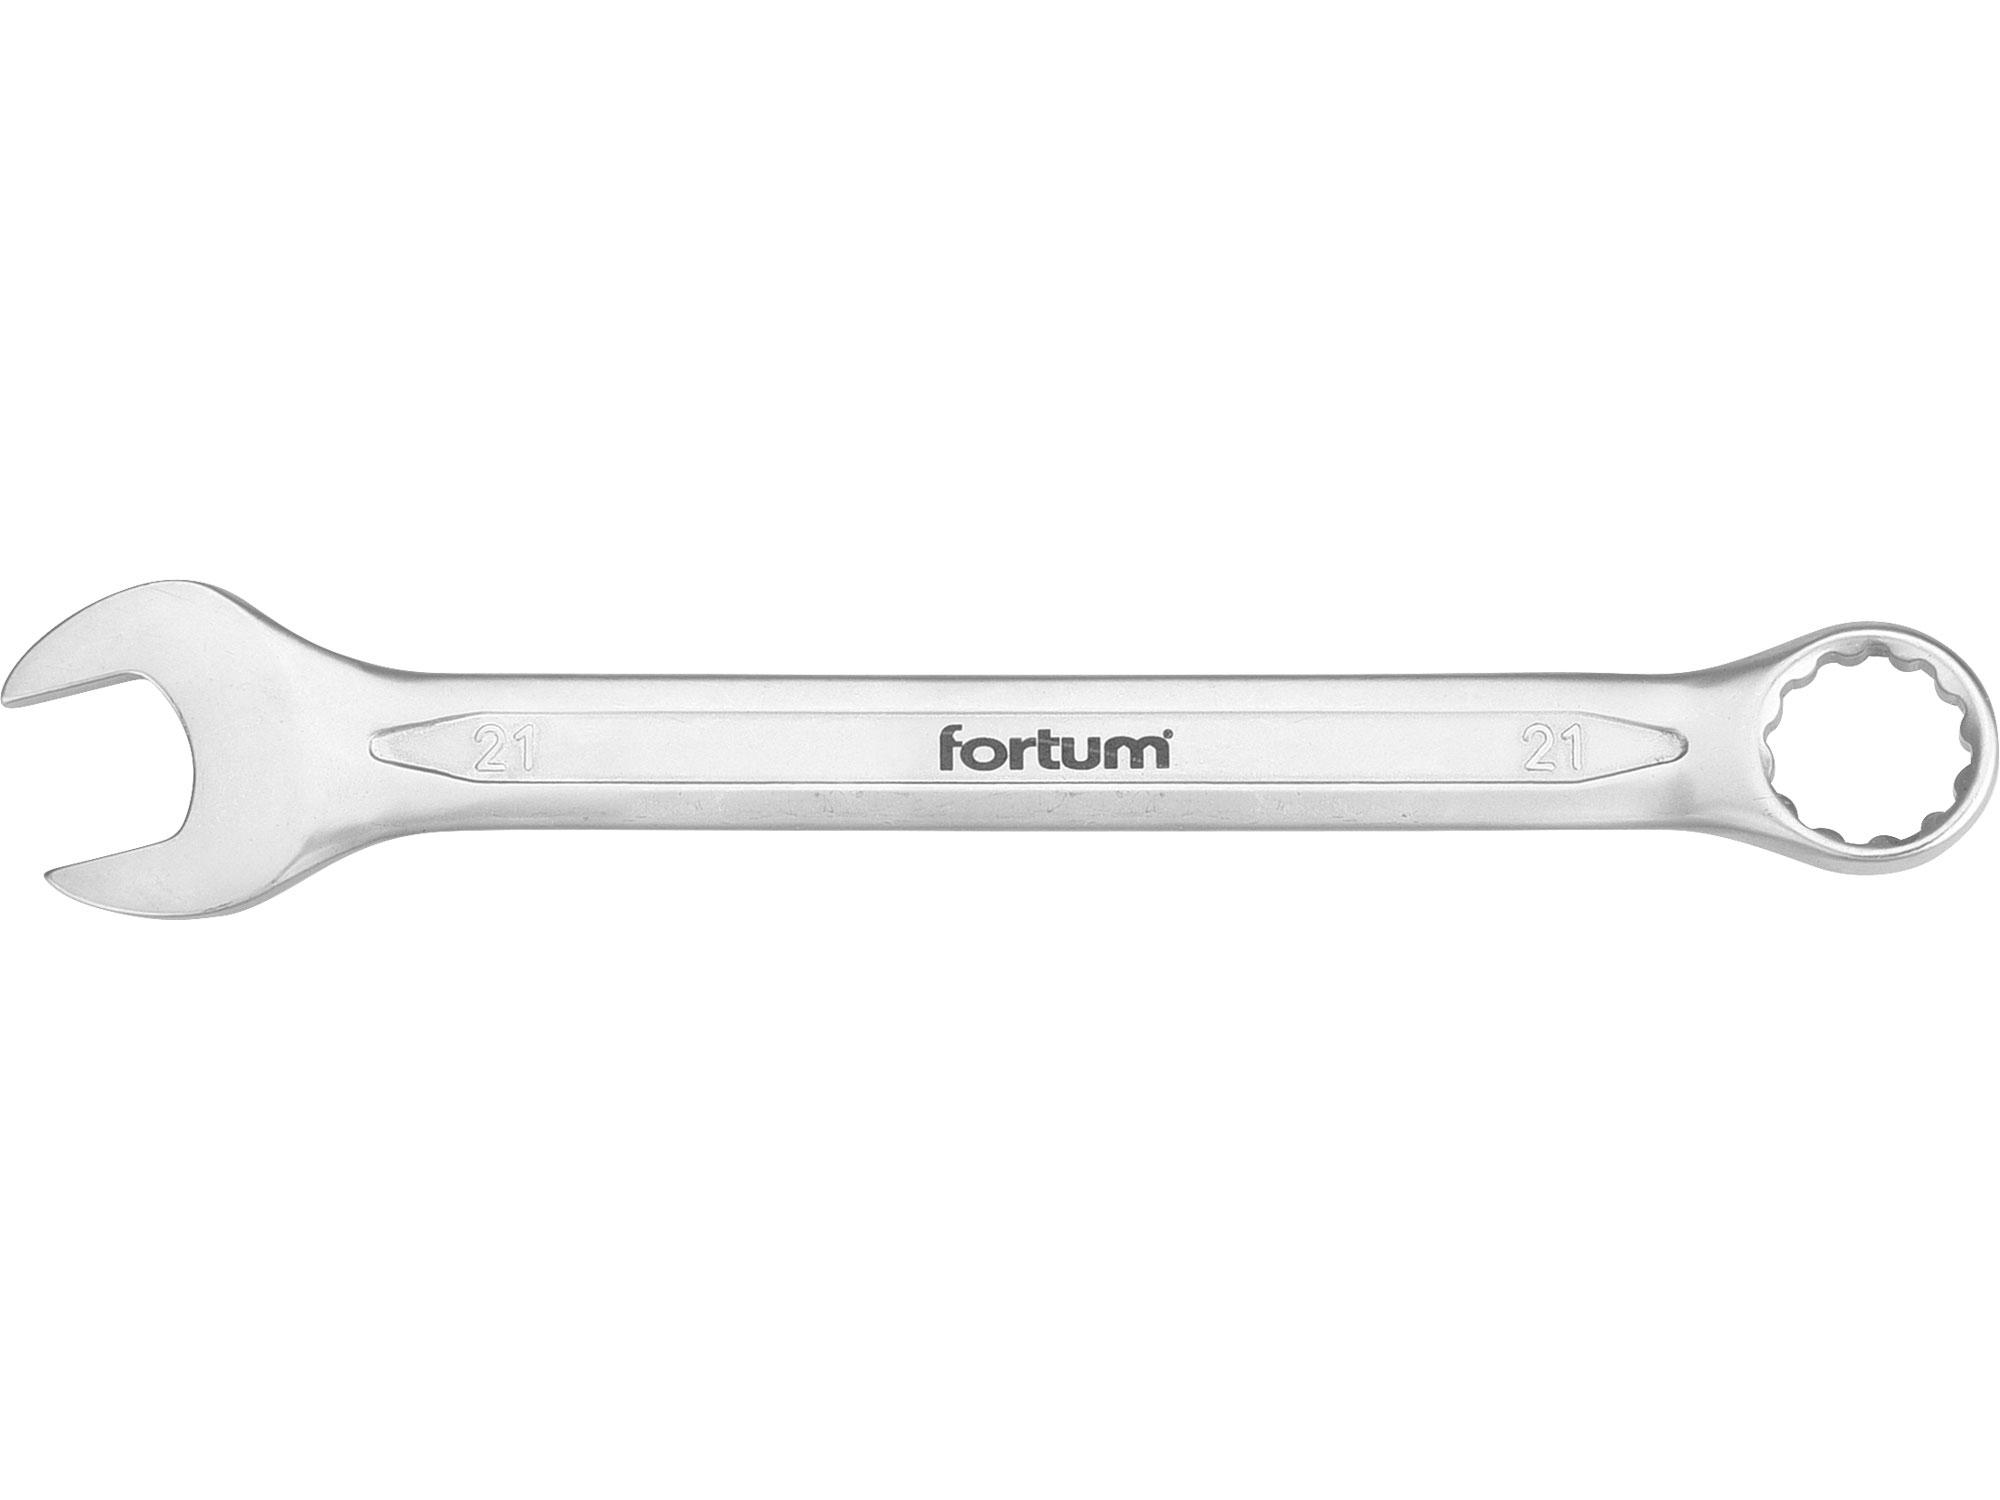 klíč očkoplochý, 21mm, L 260mm, FORTUM 4730221